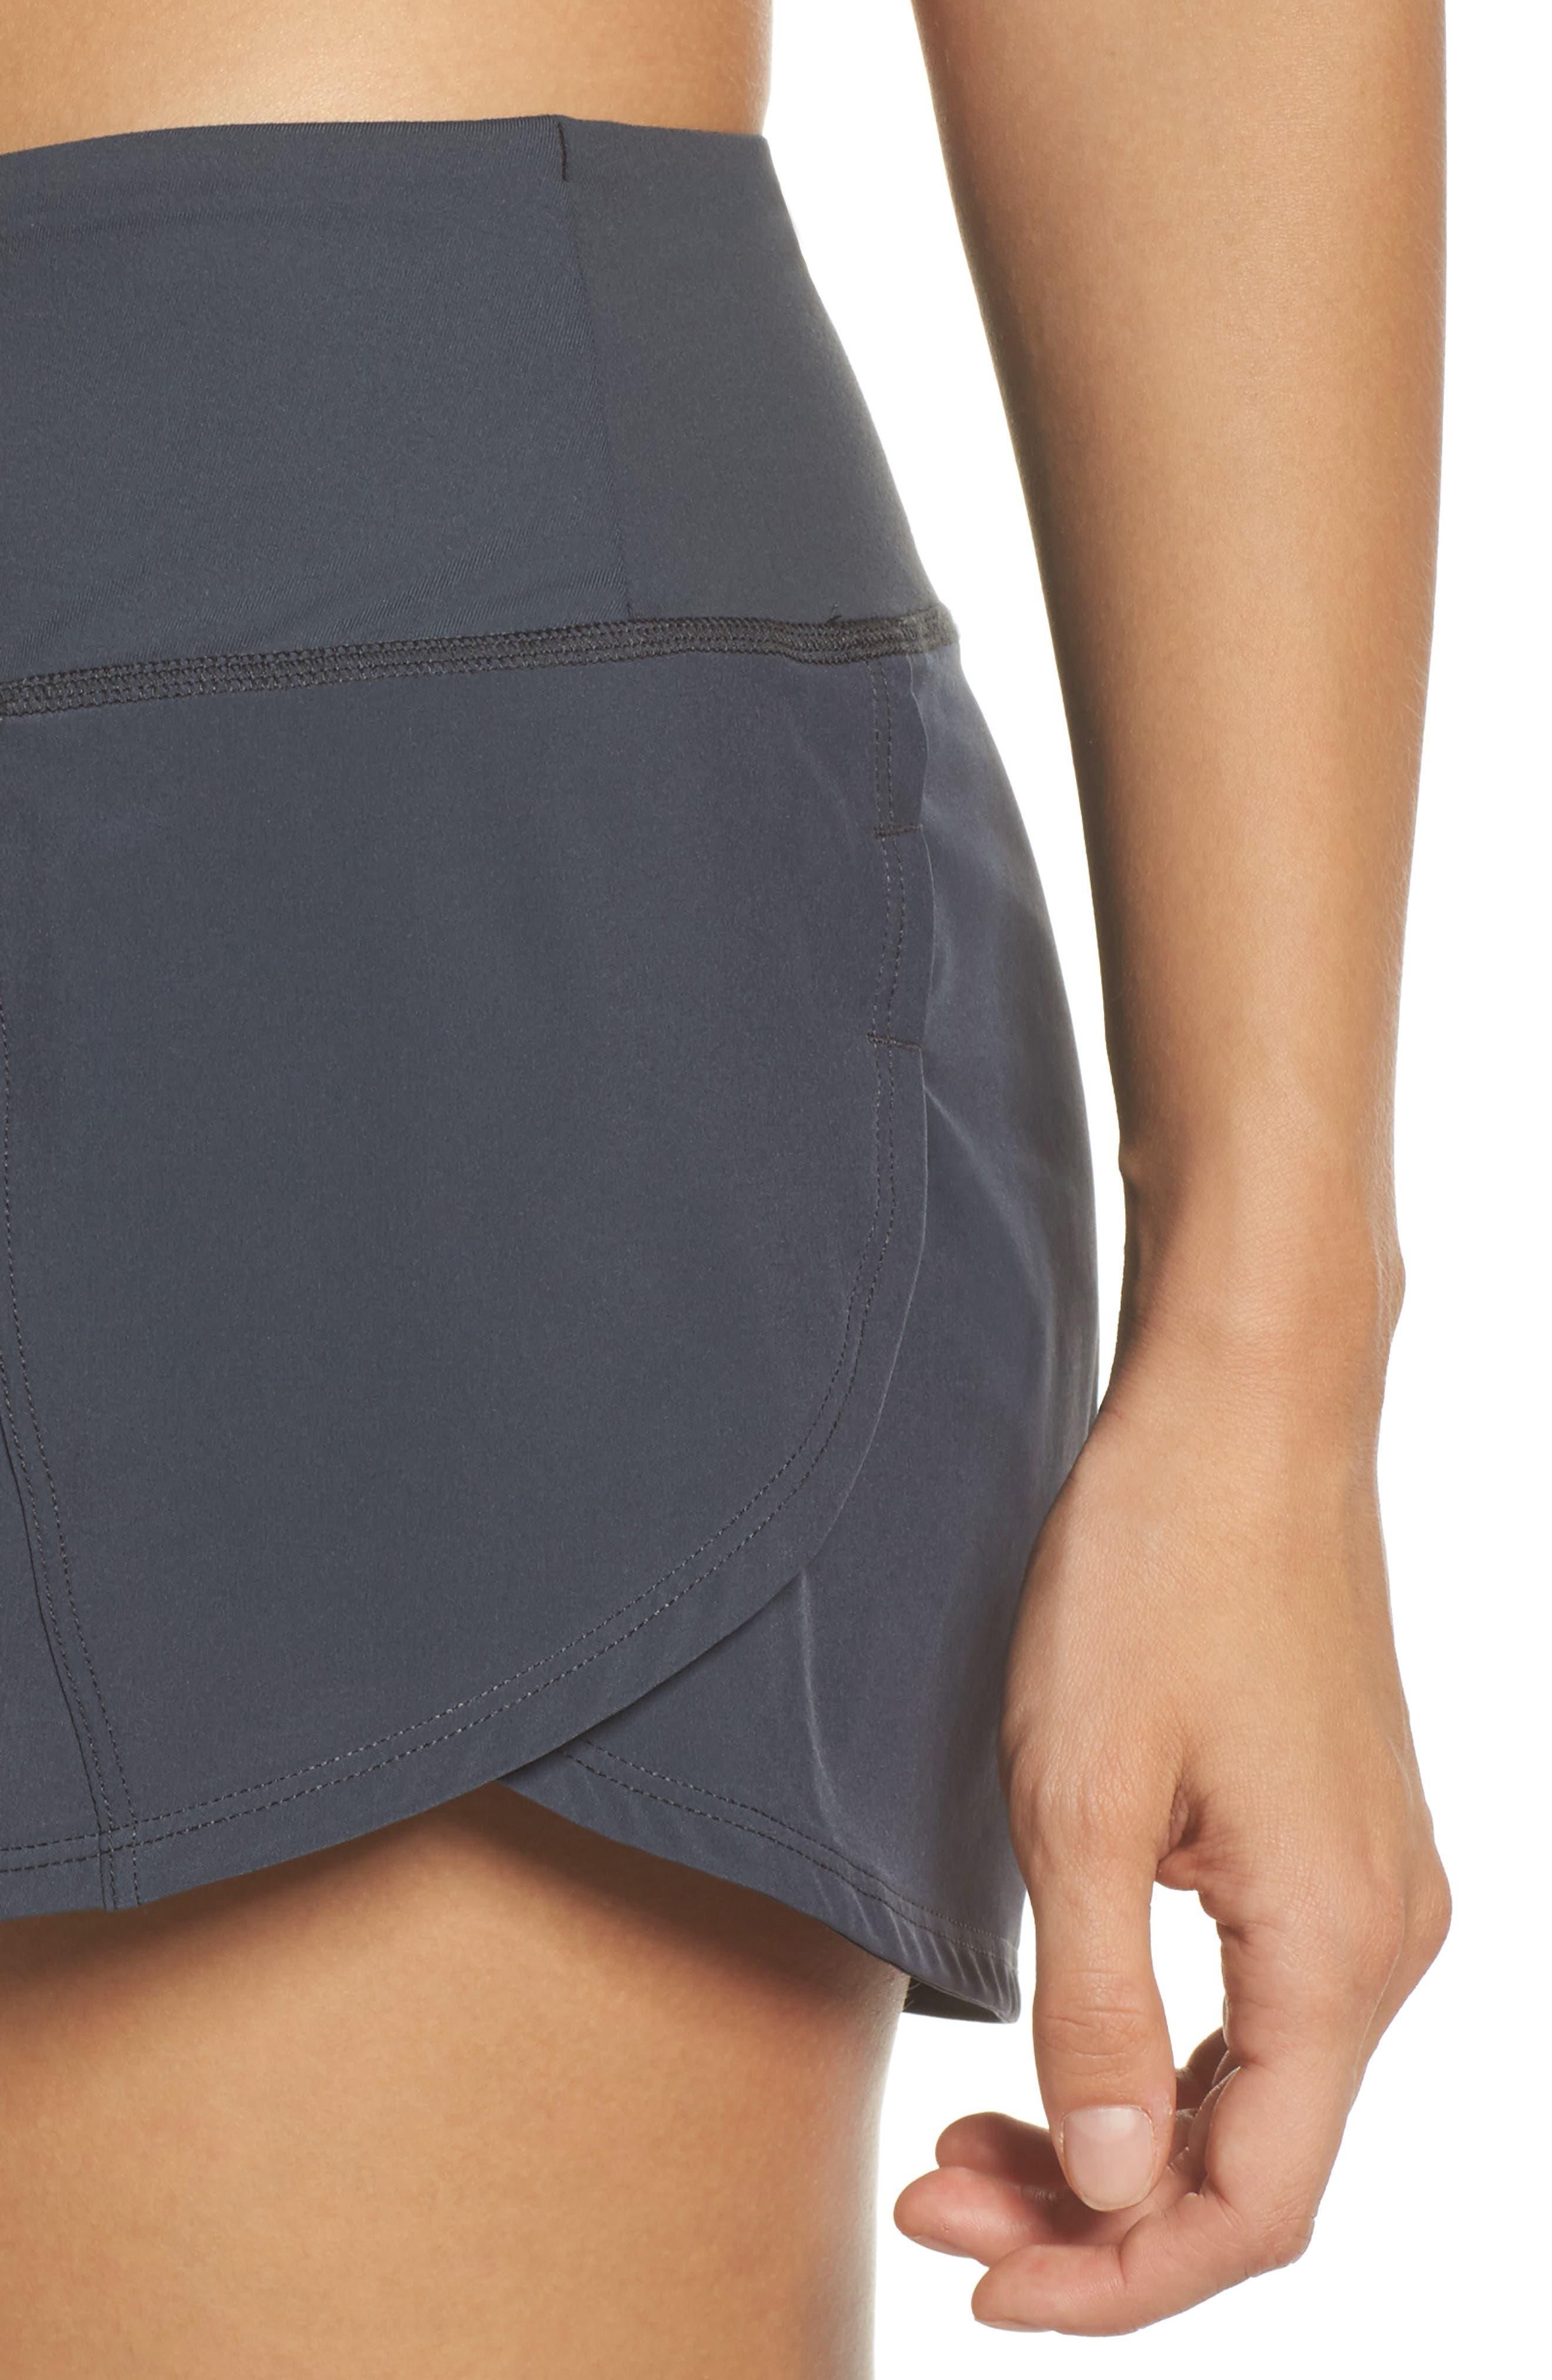 Chaser 3 Shorts,                             Alternate thumbnail 4, color,                             ASPHALT